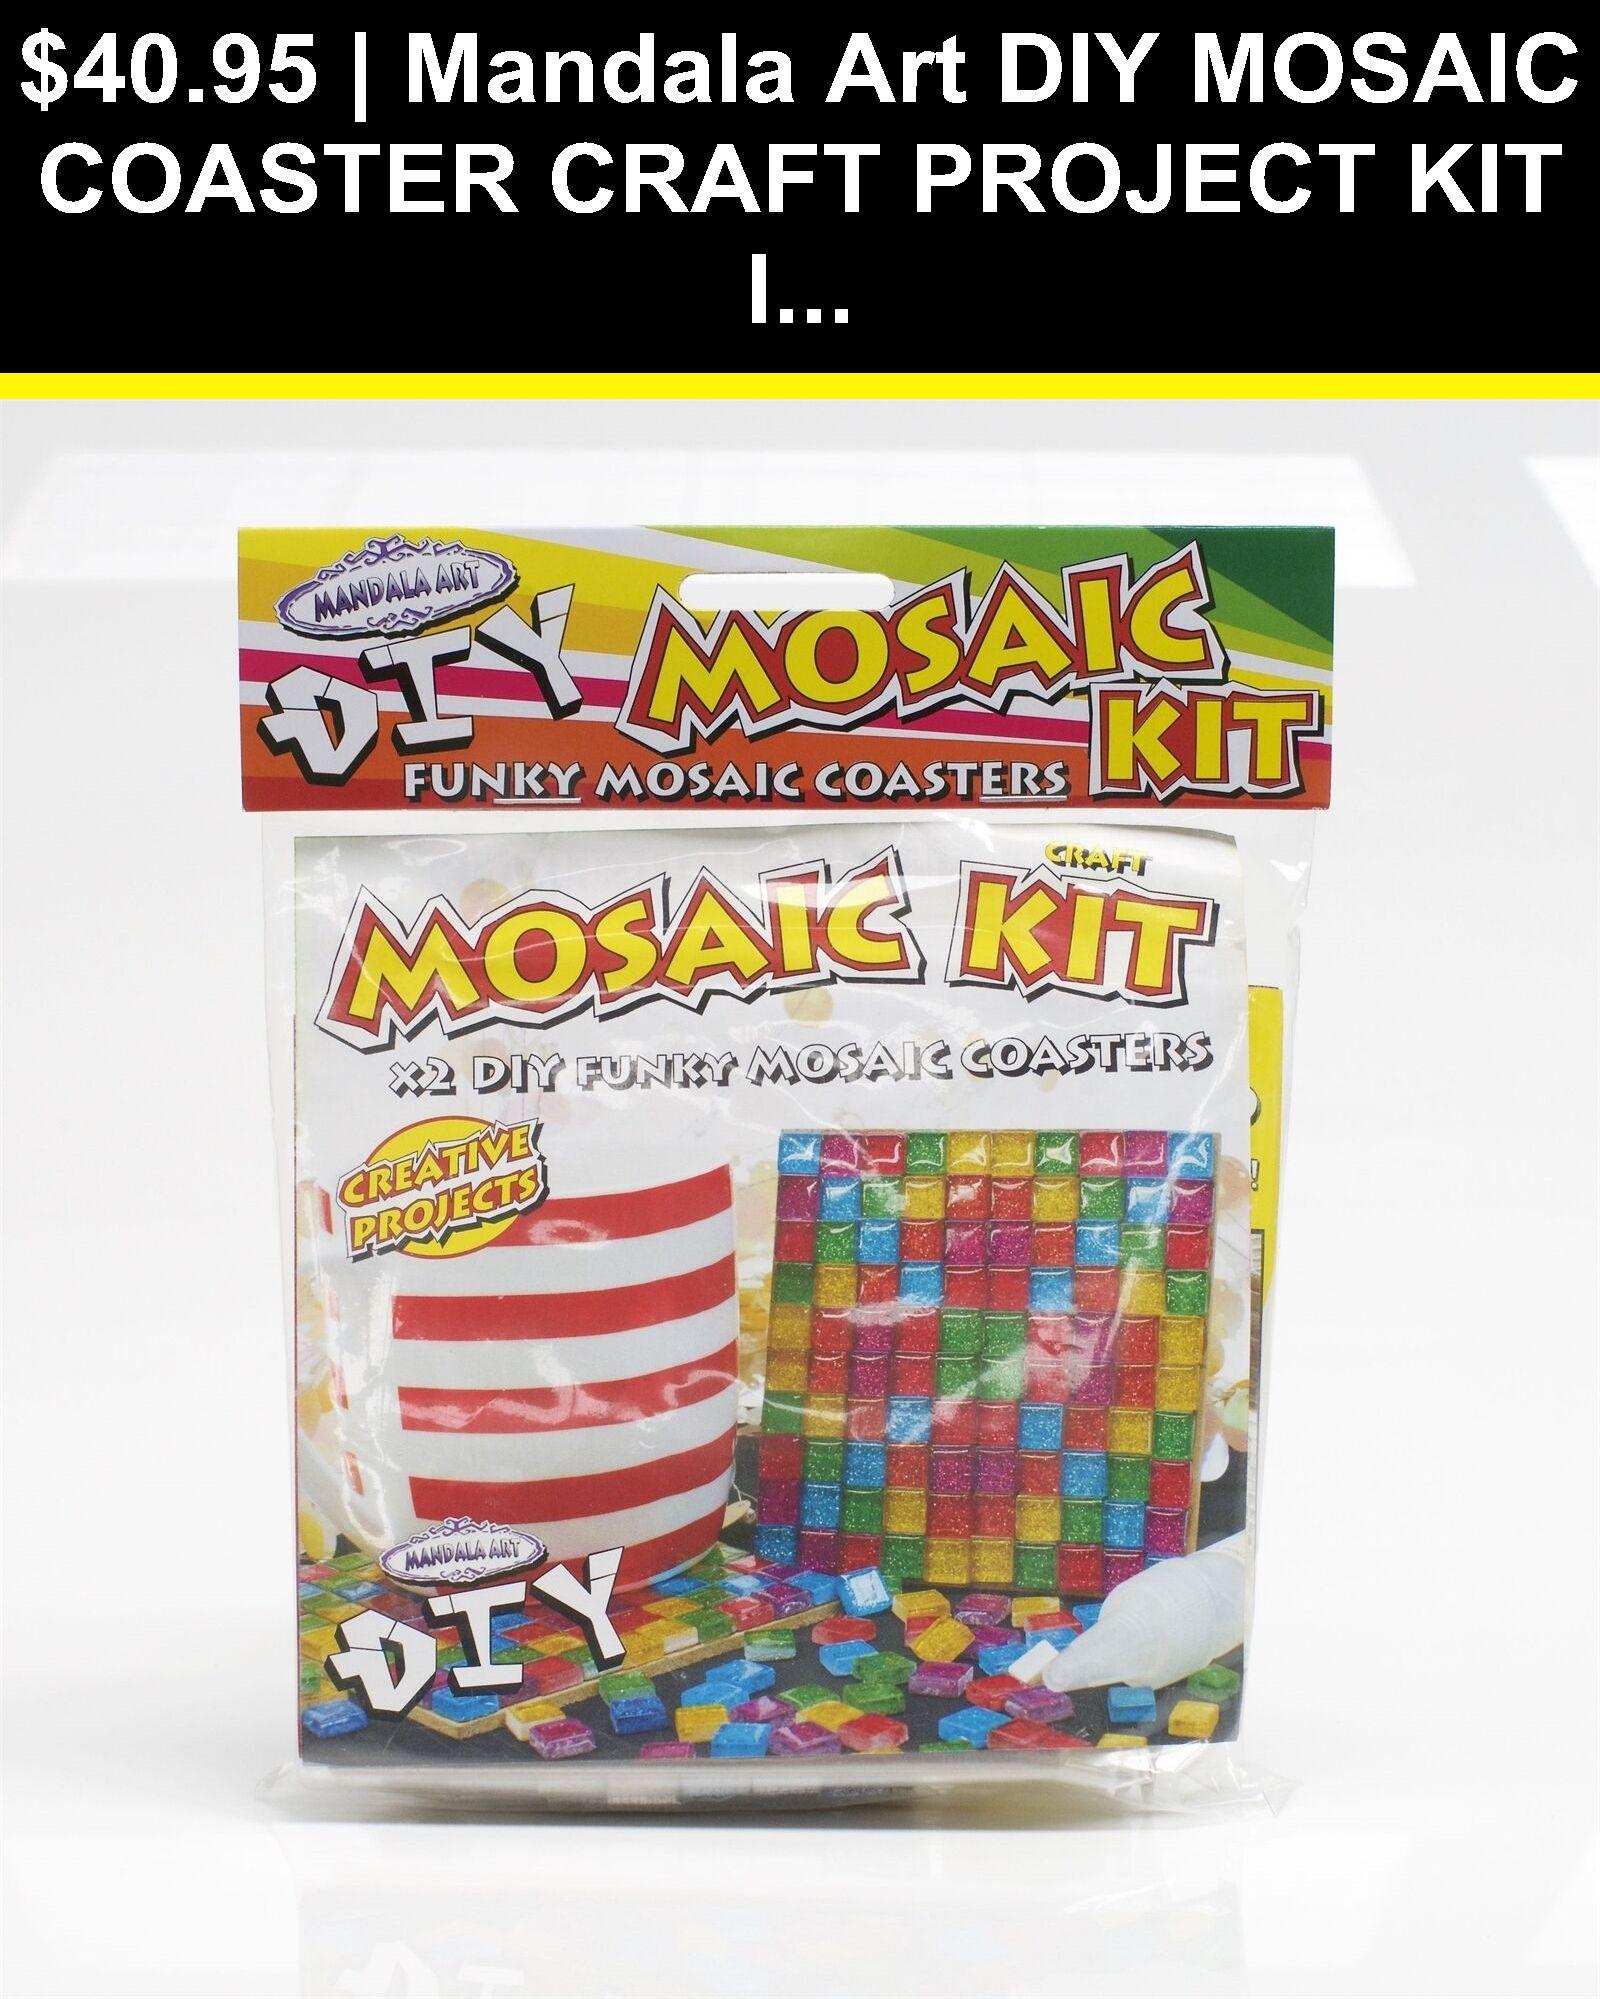 Mosaic Tools 41372 Mandala Art Diy Mosaic Coaster Craft Project Kit